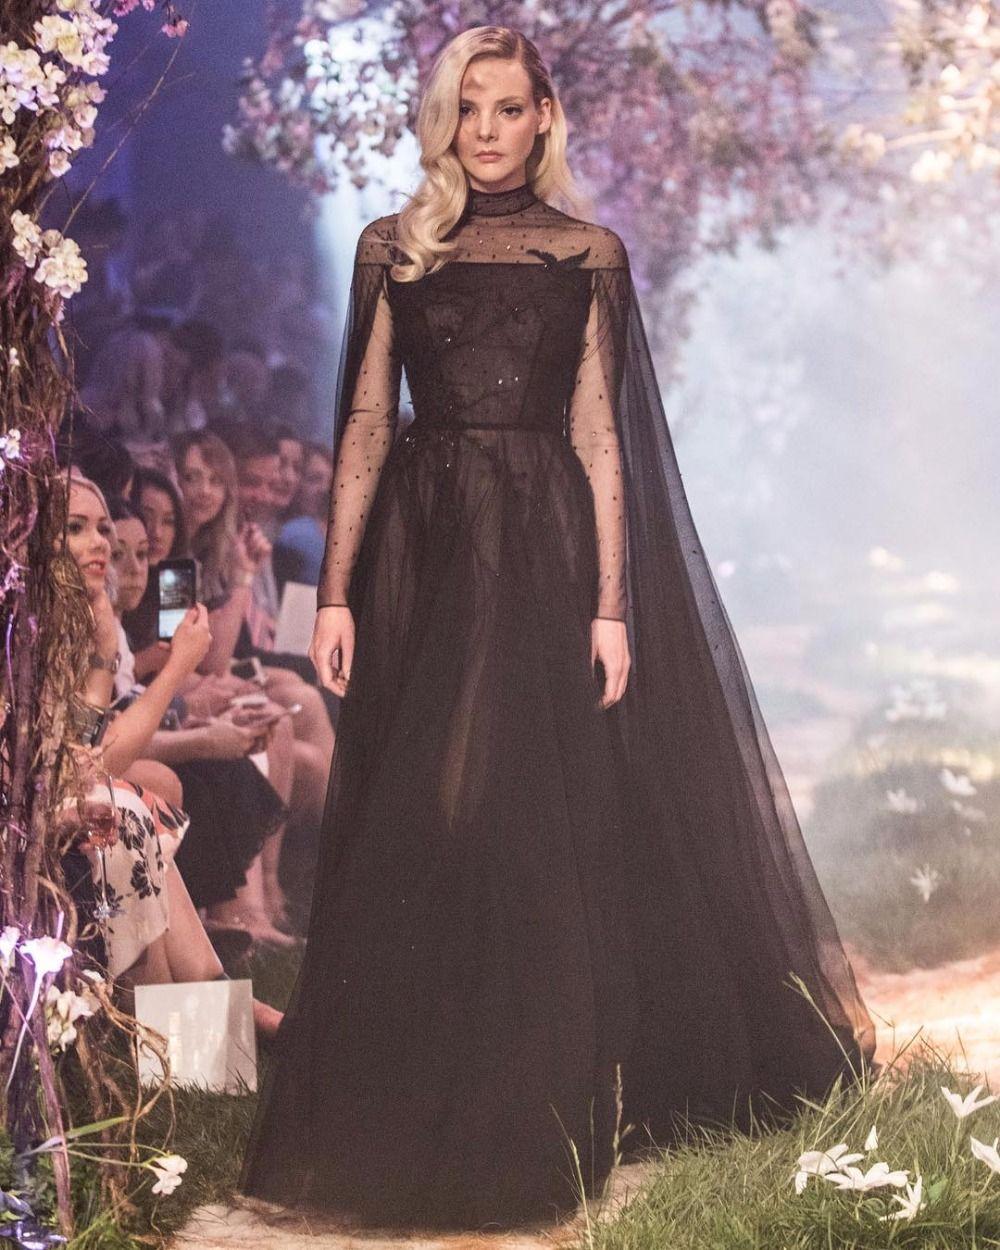 New Disney Wedding Dresses By Paolo Sebastian  Paolo sebastian